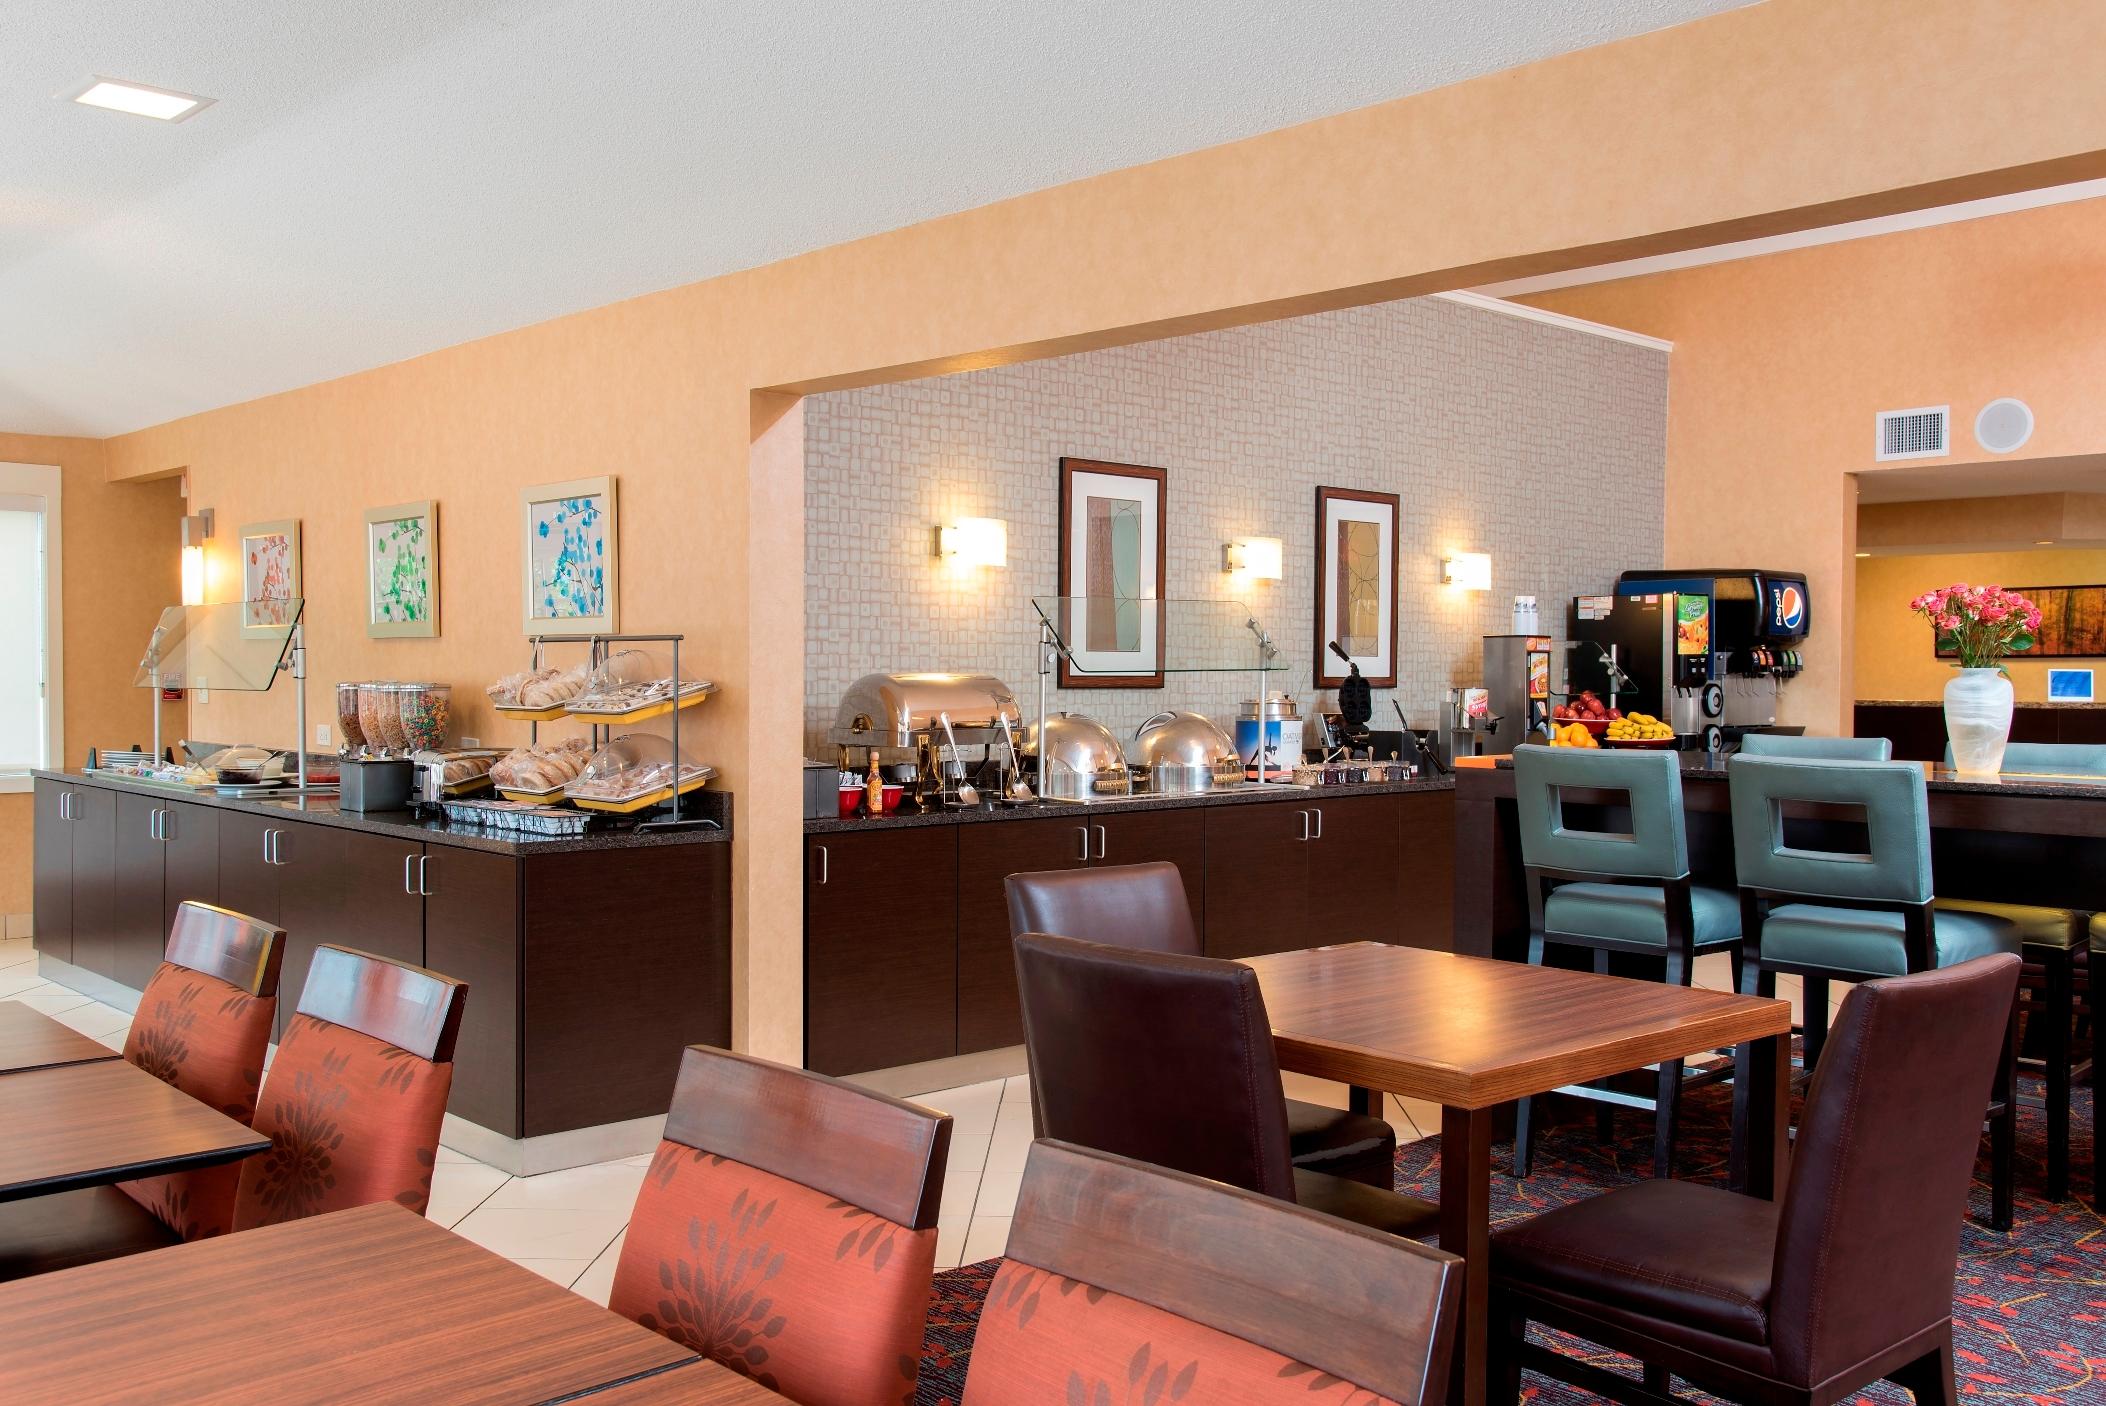 Residence Inn by Marriott Chicago Deerfield image 1